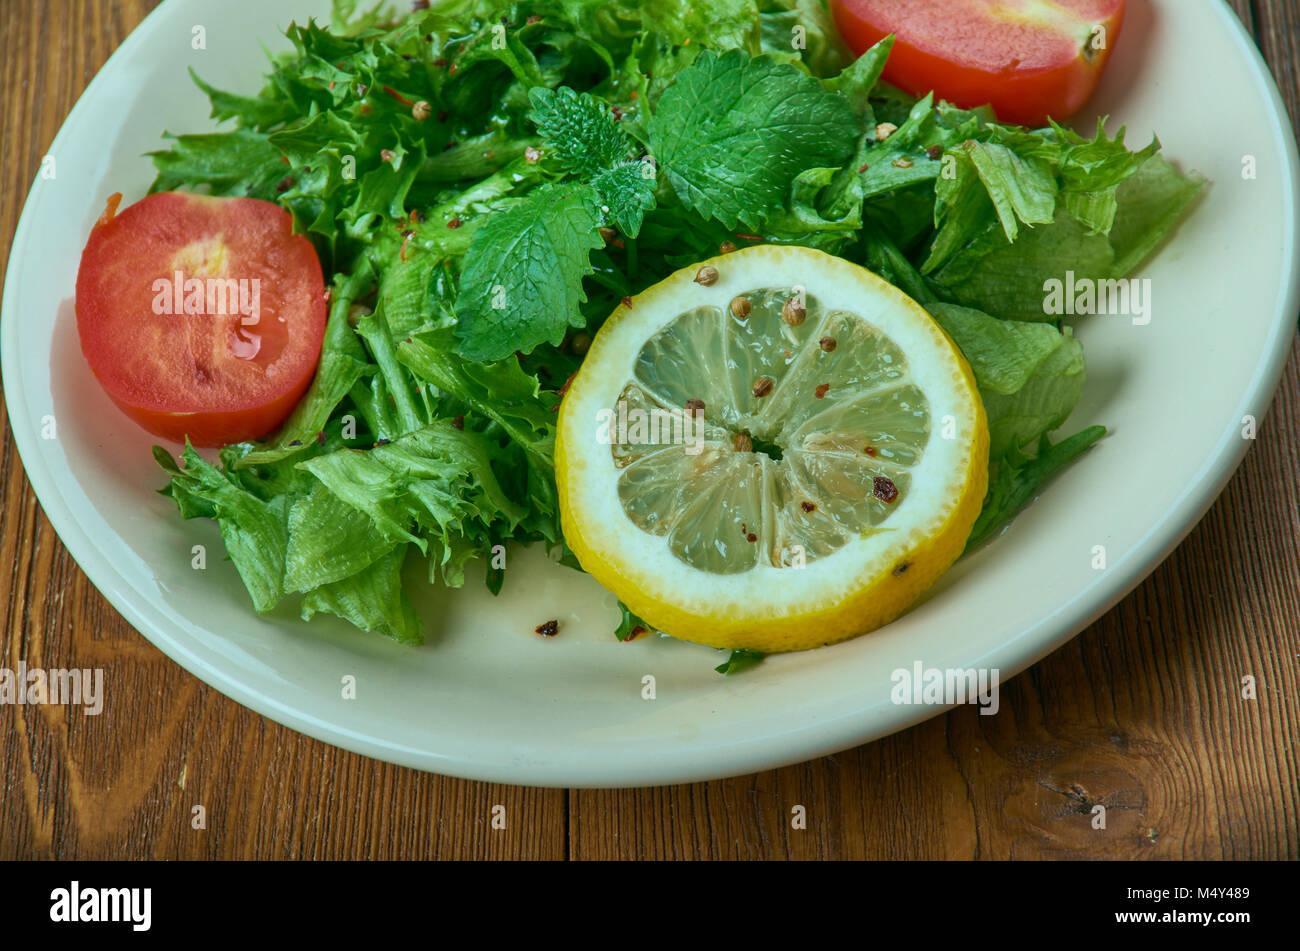 salad from leaves of wild radish - Stock Image